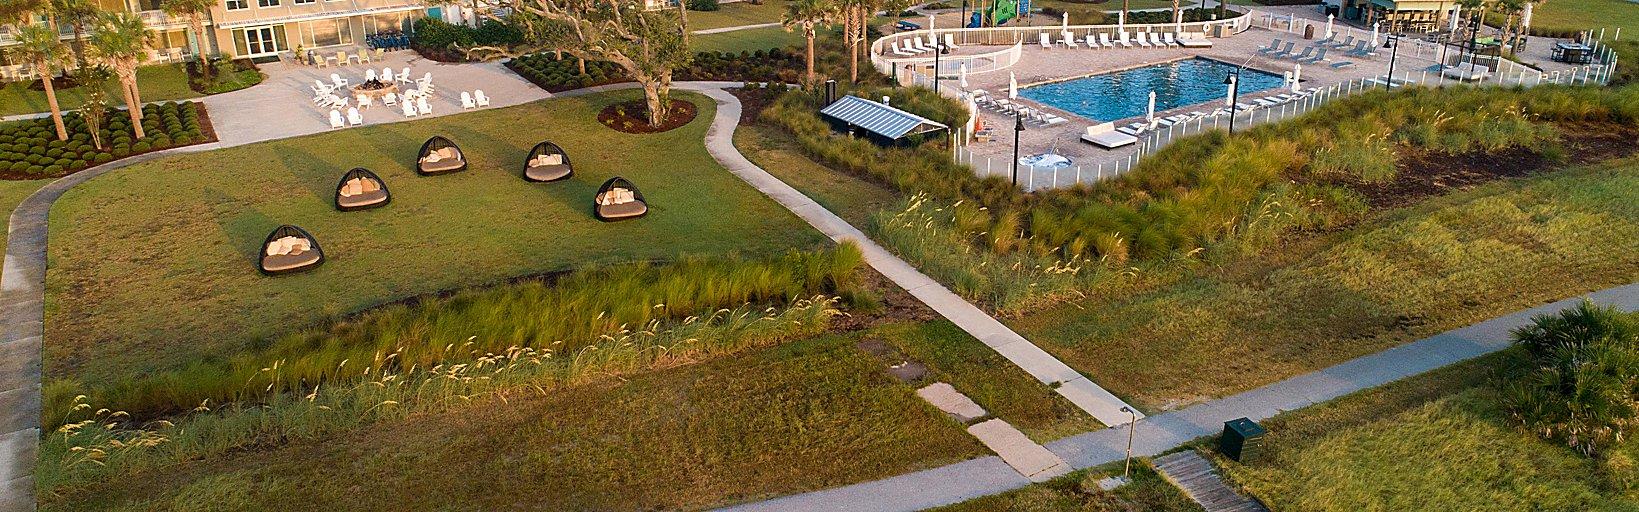 Jekyll Island Hotels   Holiday Inn Resort Jekyll Island